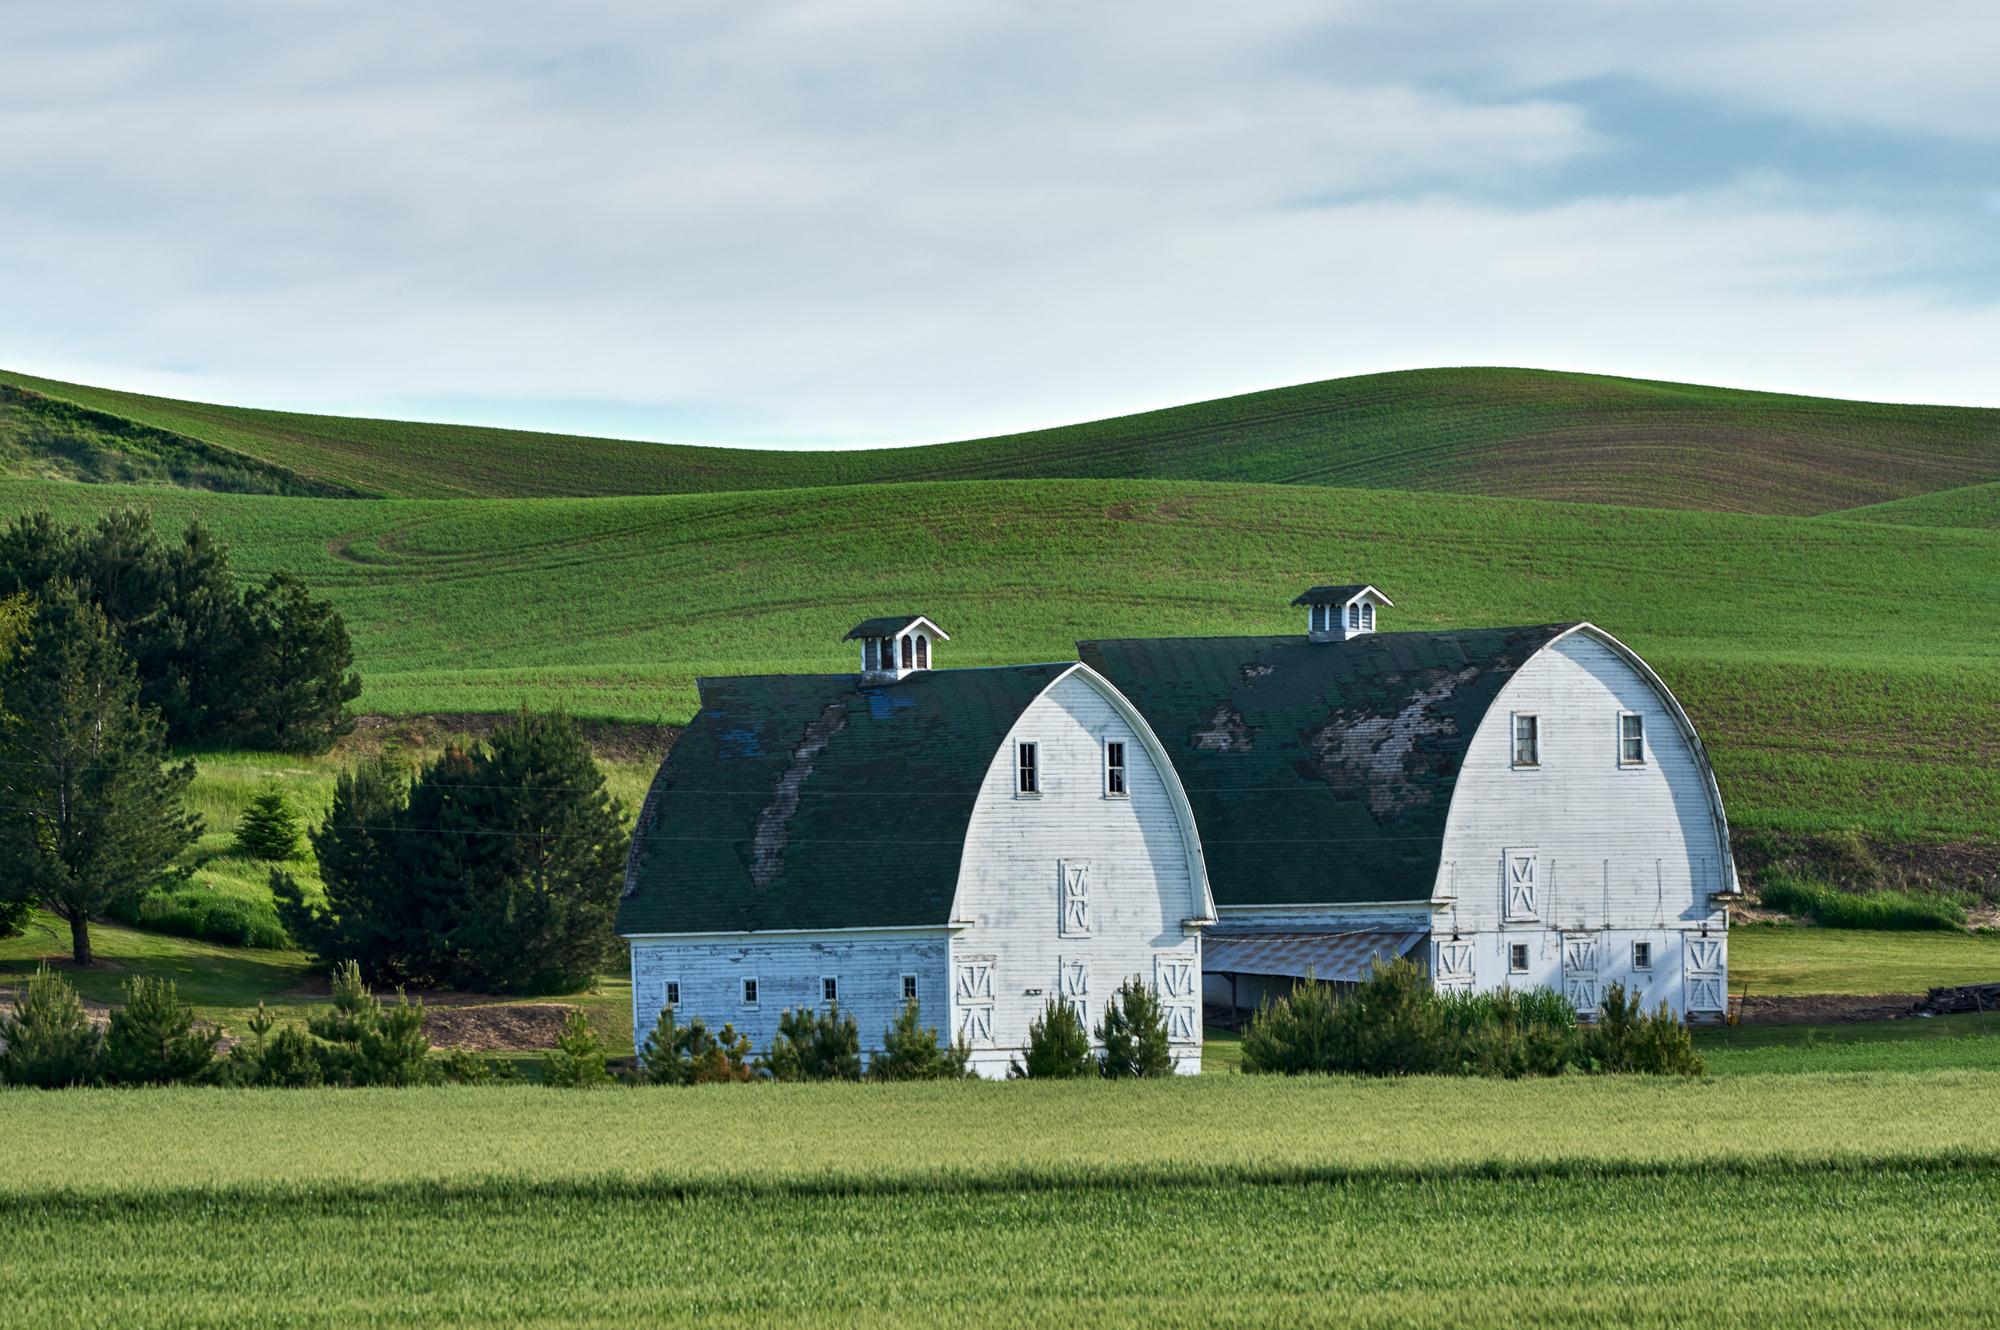 Twin White Barns